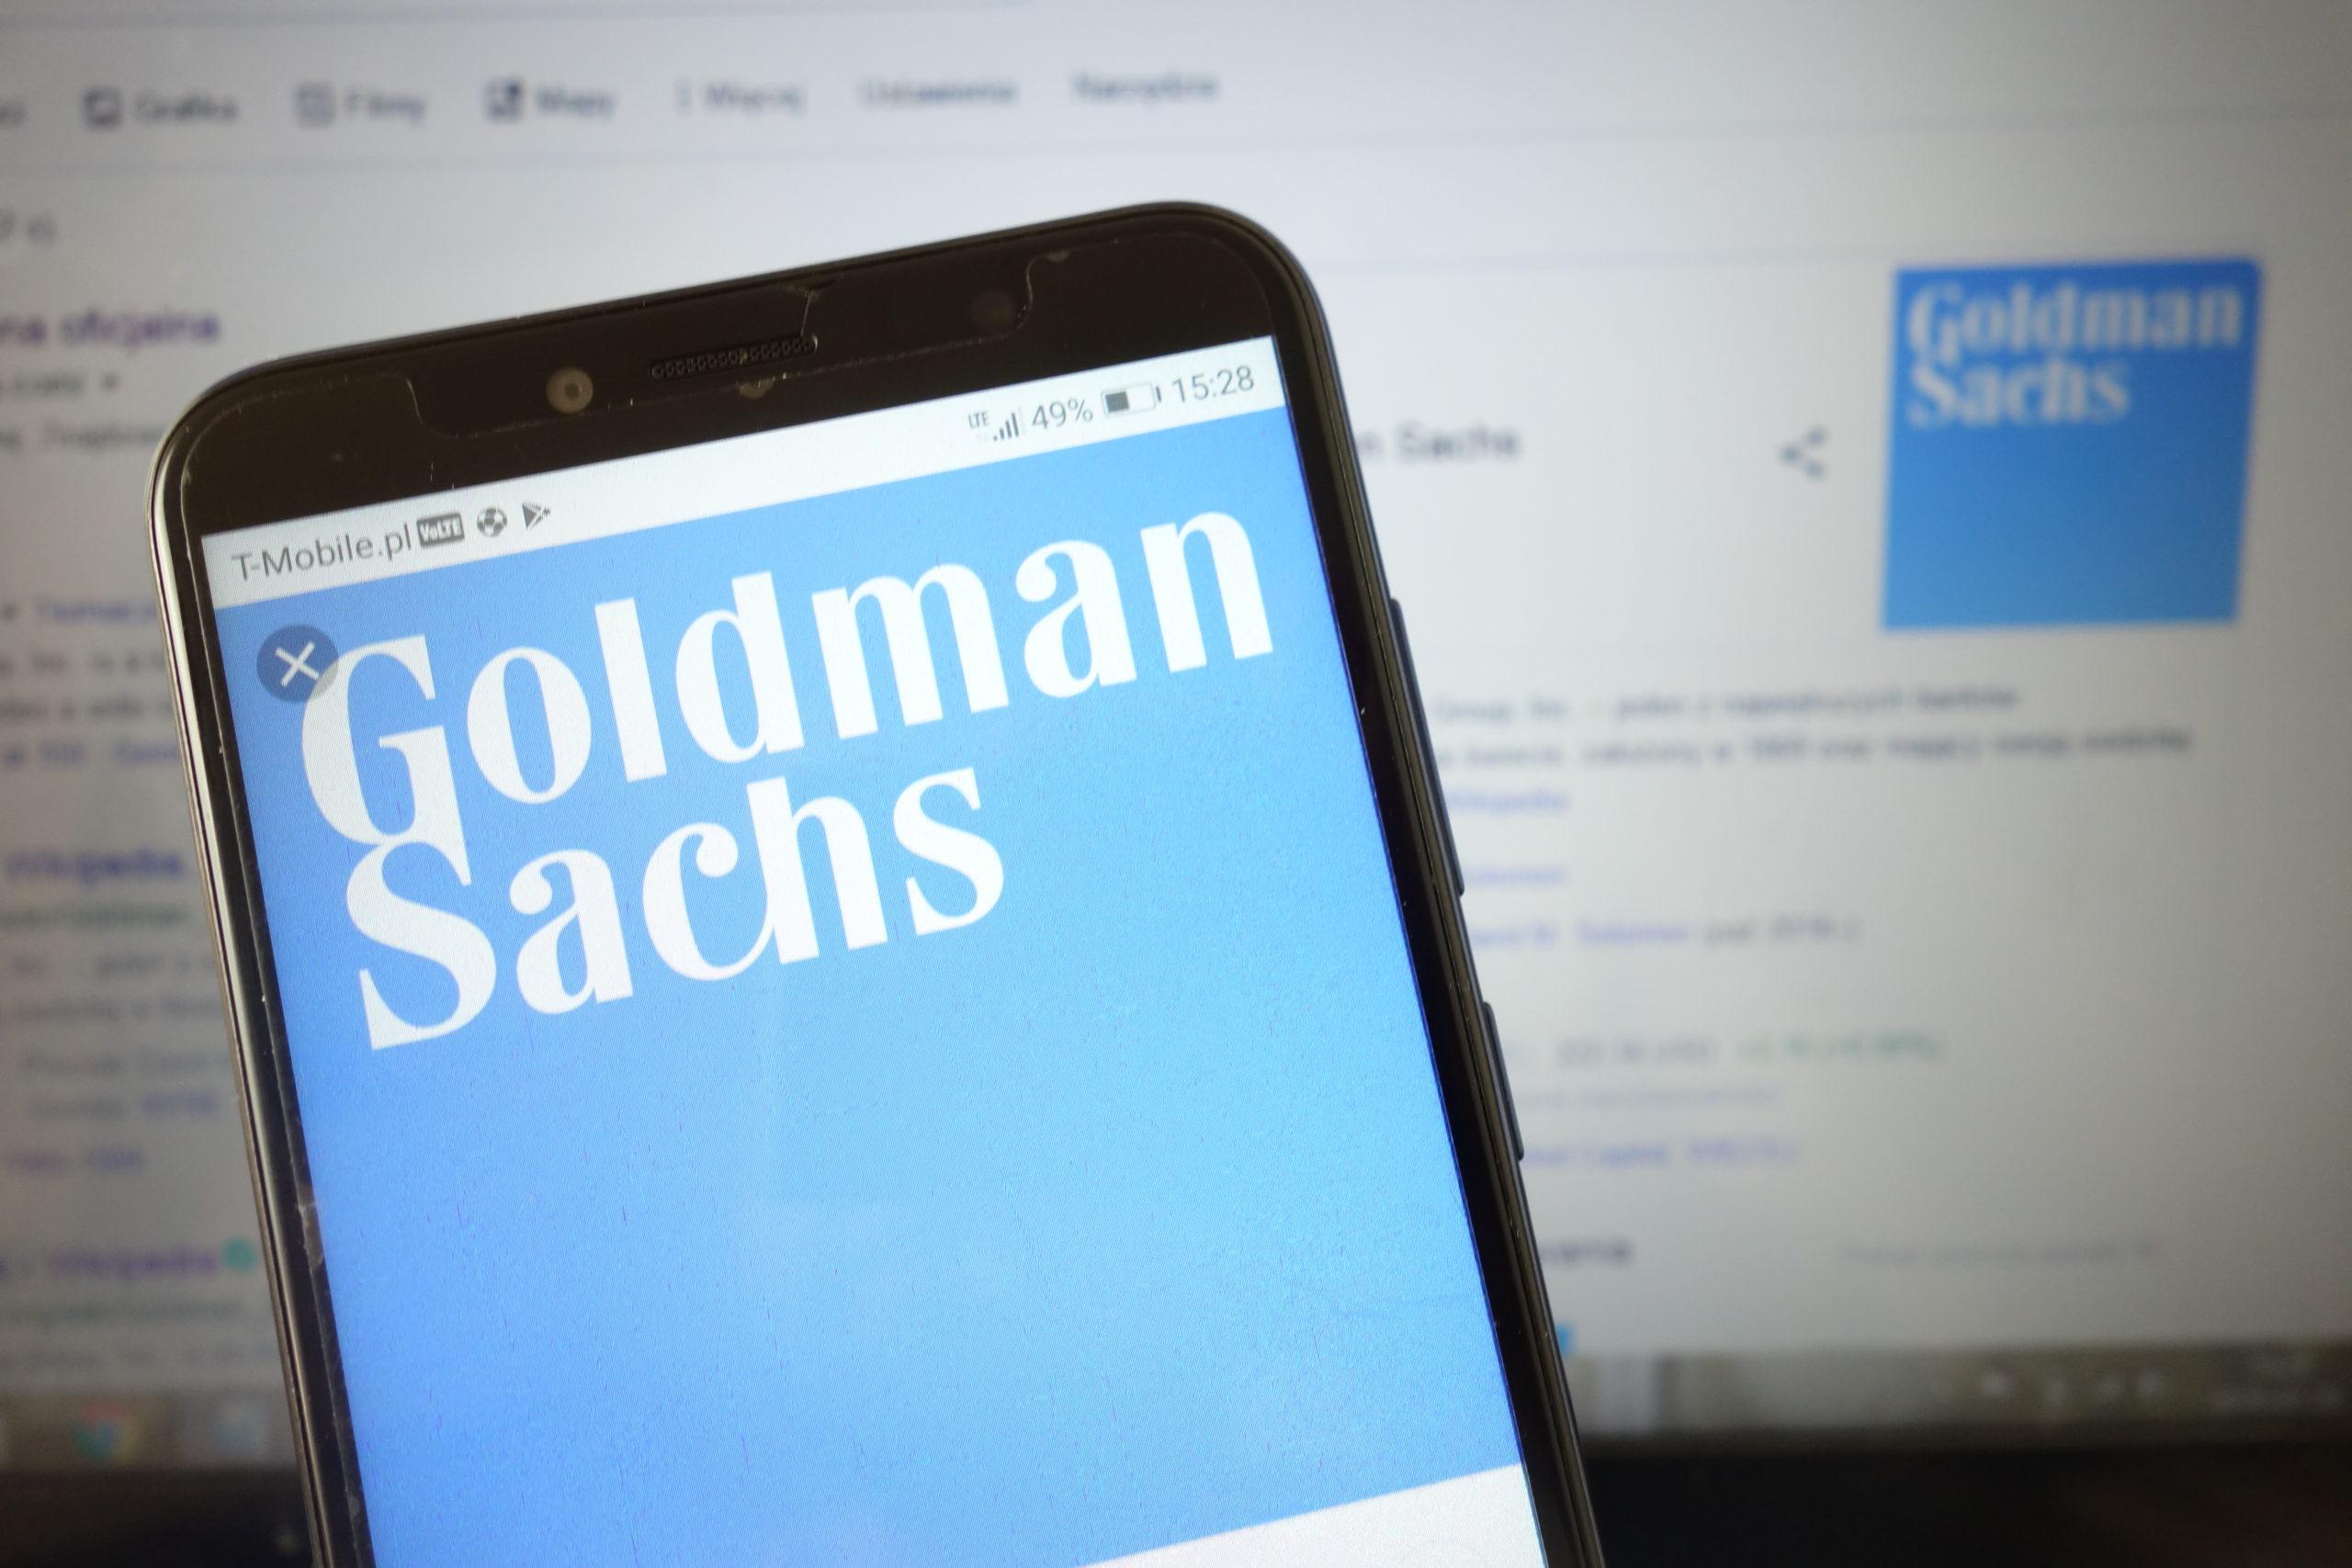 Goldman Sachs kürzt CEO-Vergütung um 10 Millionen US-Dollar